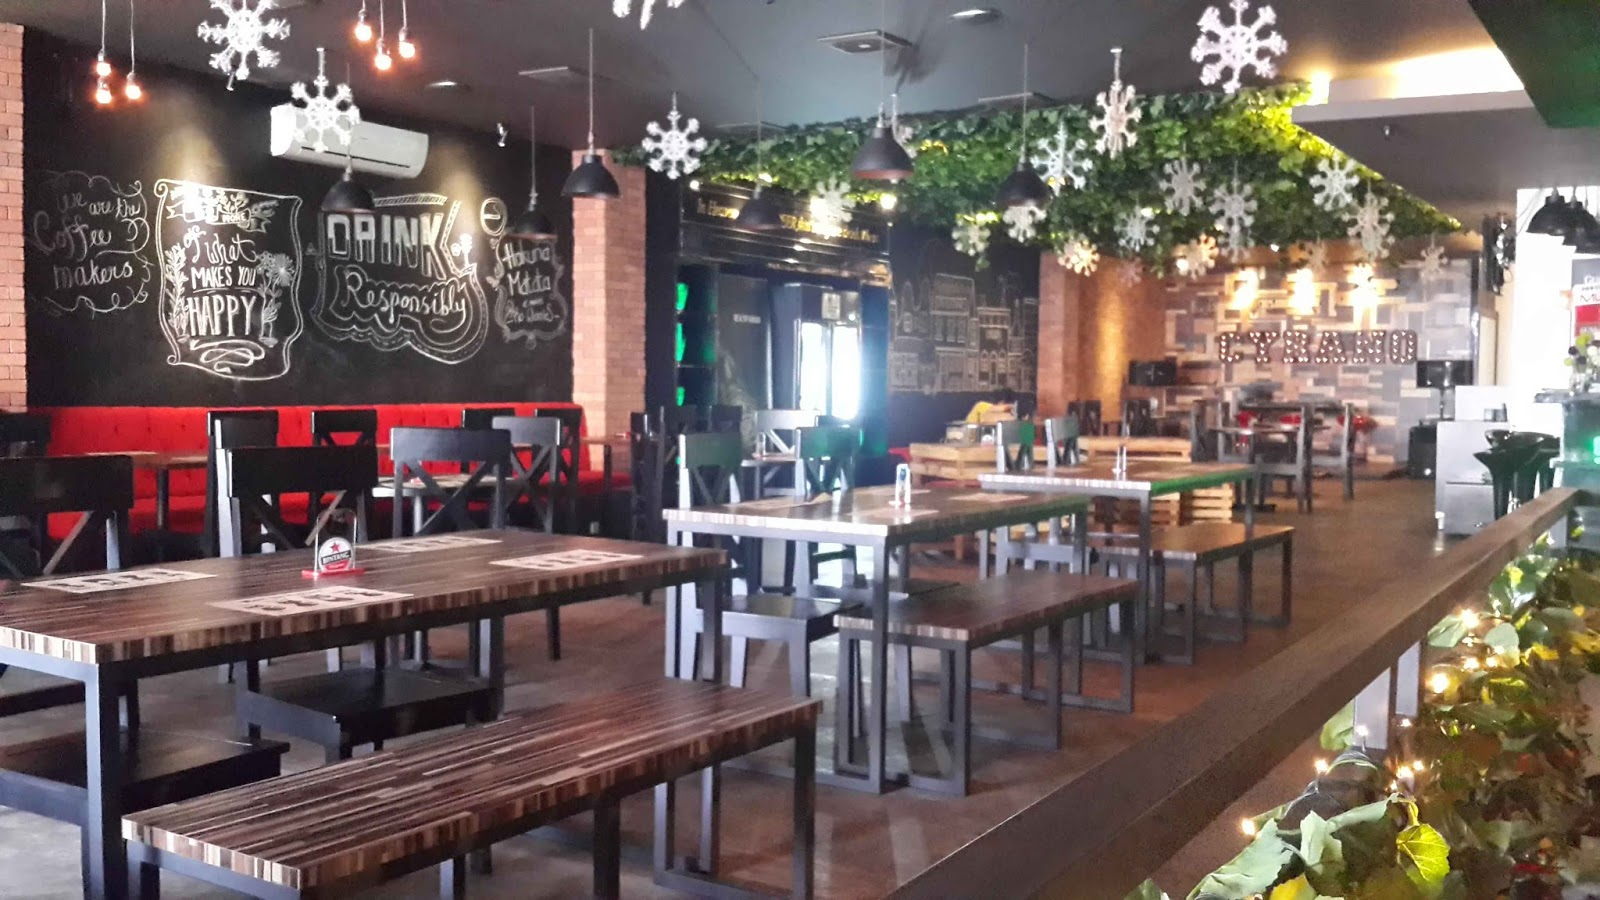 Cyrano Cafe Tempat Ngopi Asyik Bareng Teman